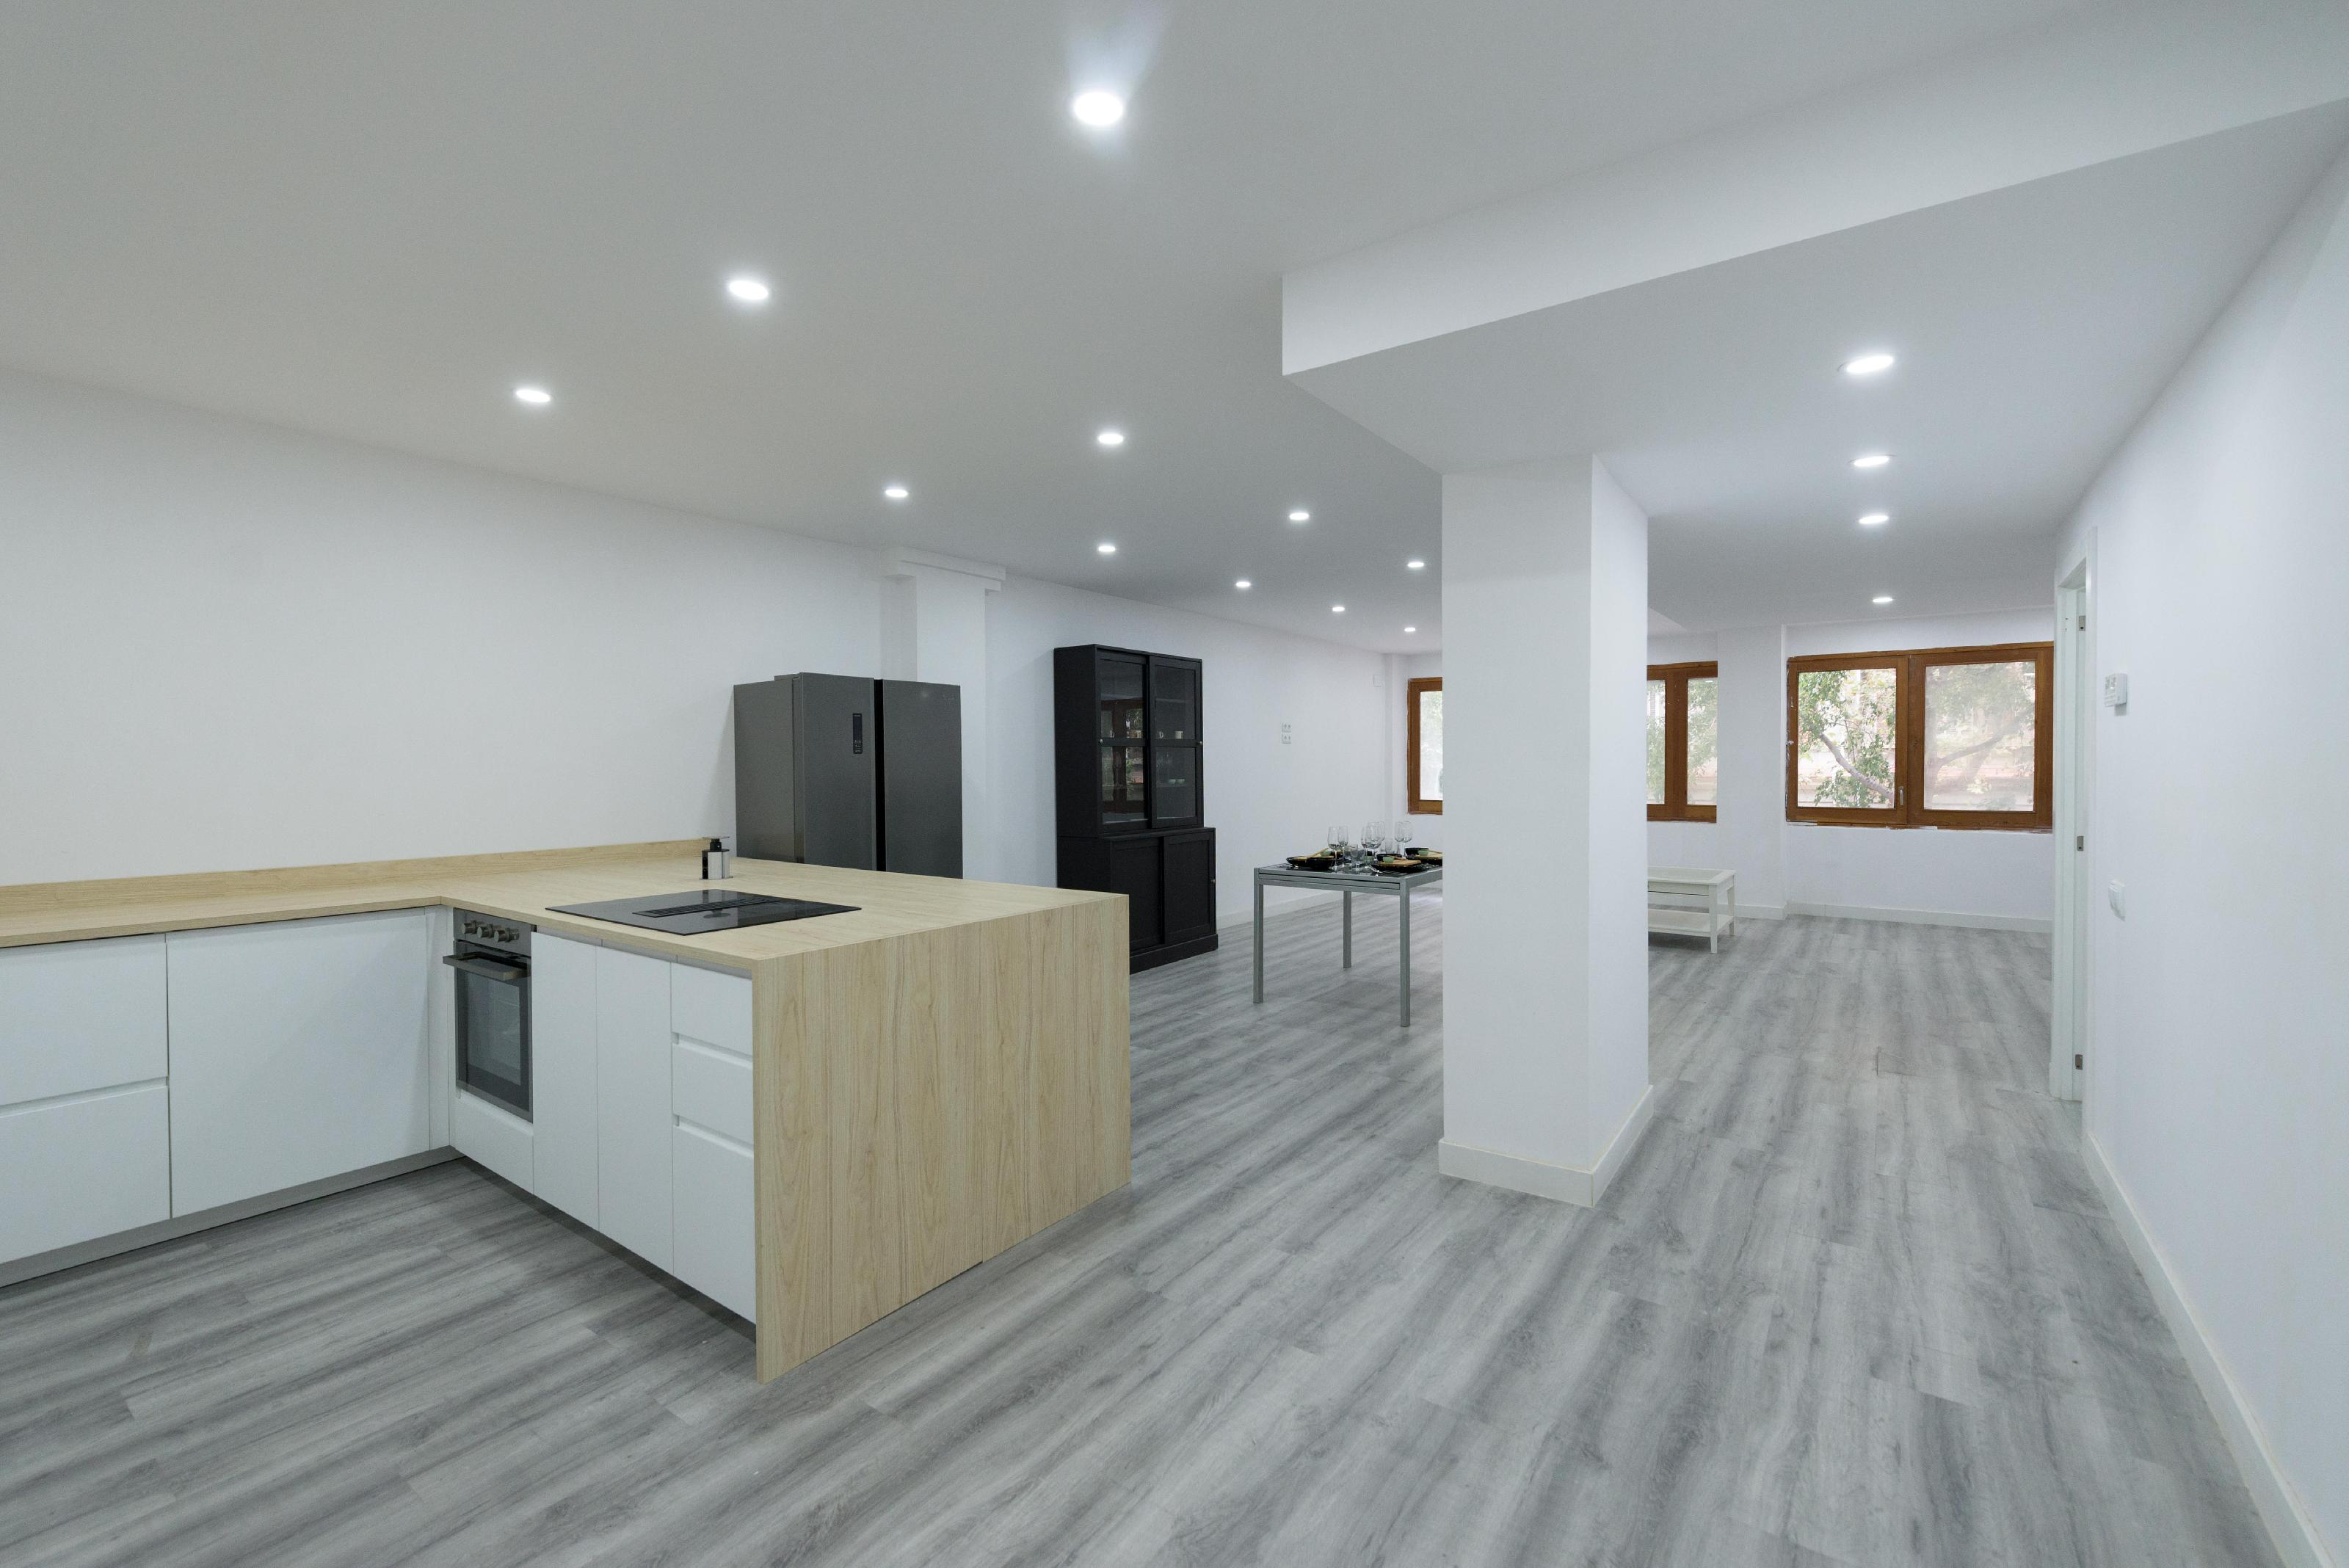 242980 Flat for sale in Eixample, Sagrada Familia 3